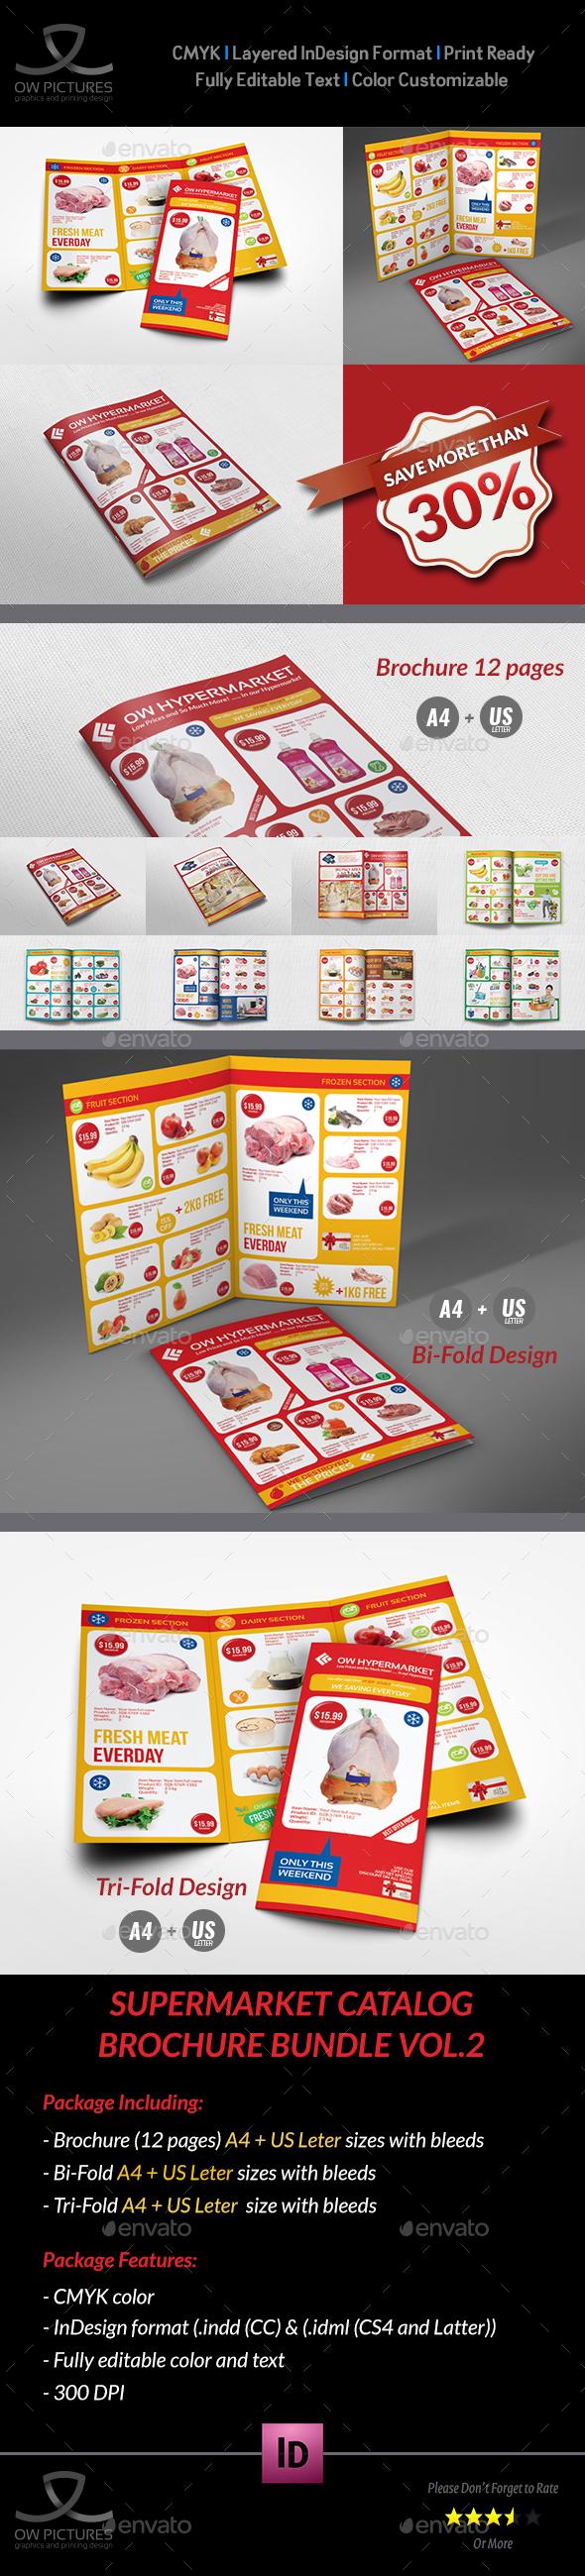 Supermarket Catalog Brochure Bundle Template Vol.2